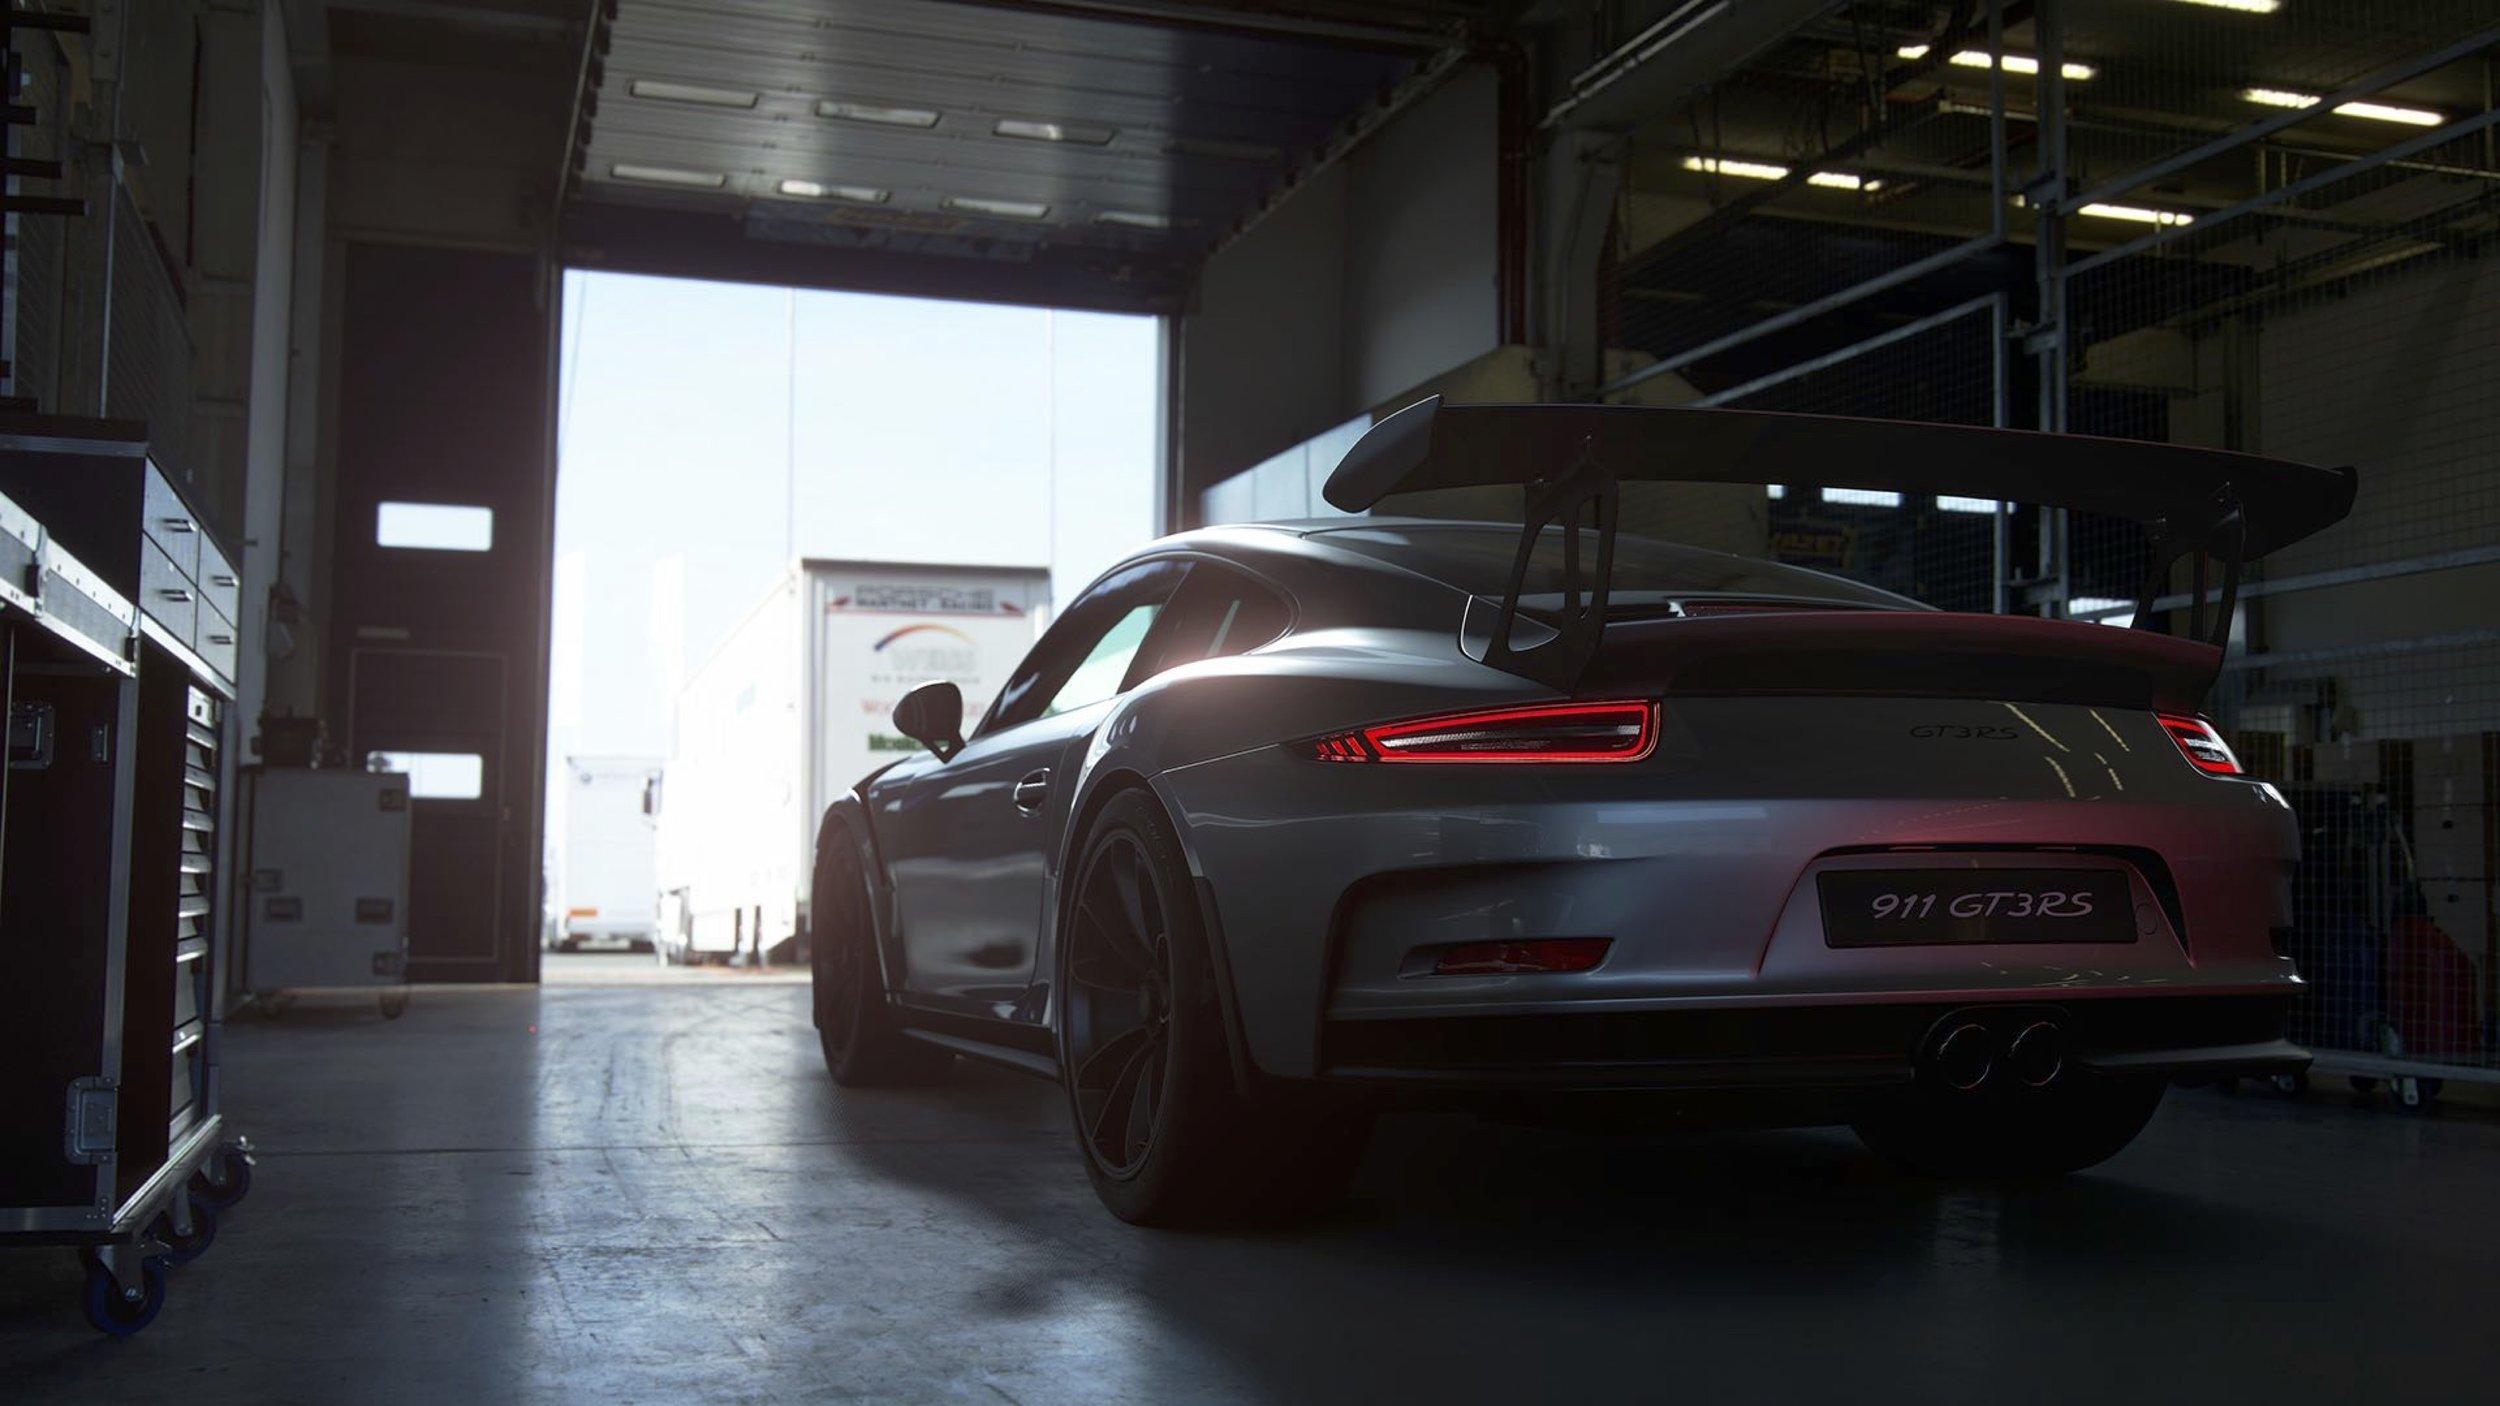 Gran-Turismo-Sport-Porsche-911-GT-3-RS-Scape-5.jpeg